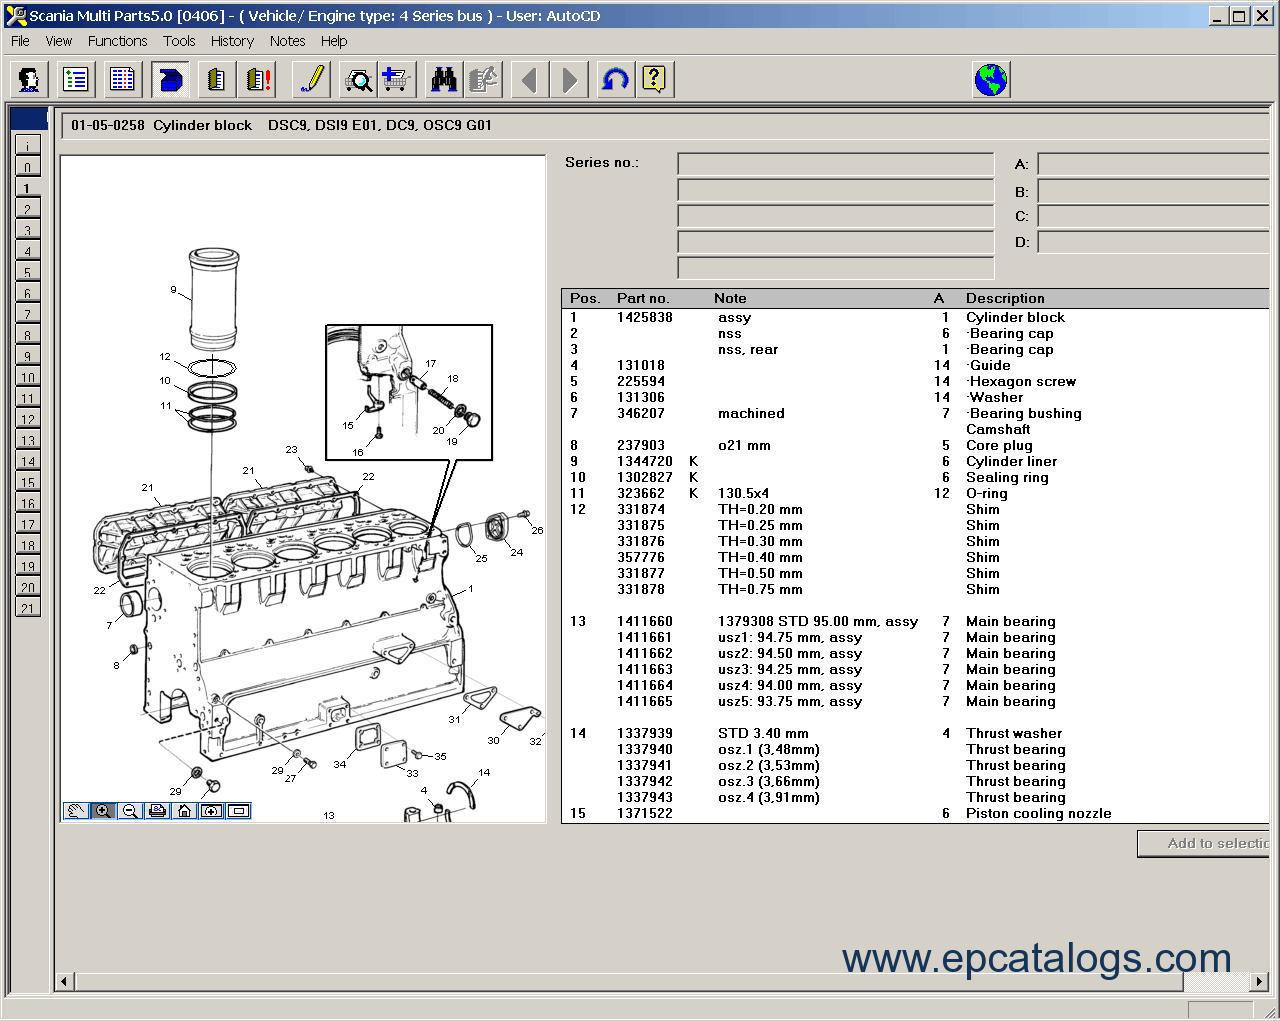 Enlarge spare parts catalog scania multi 2012 3 enlarge